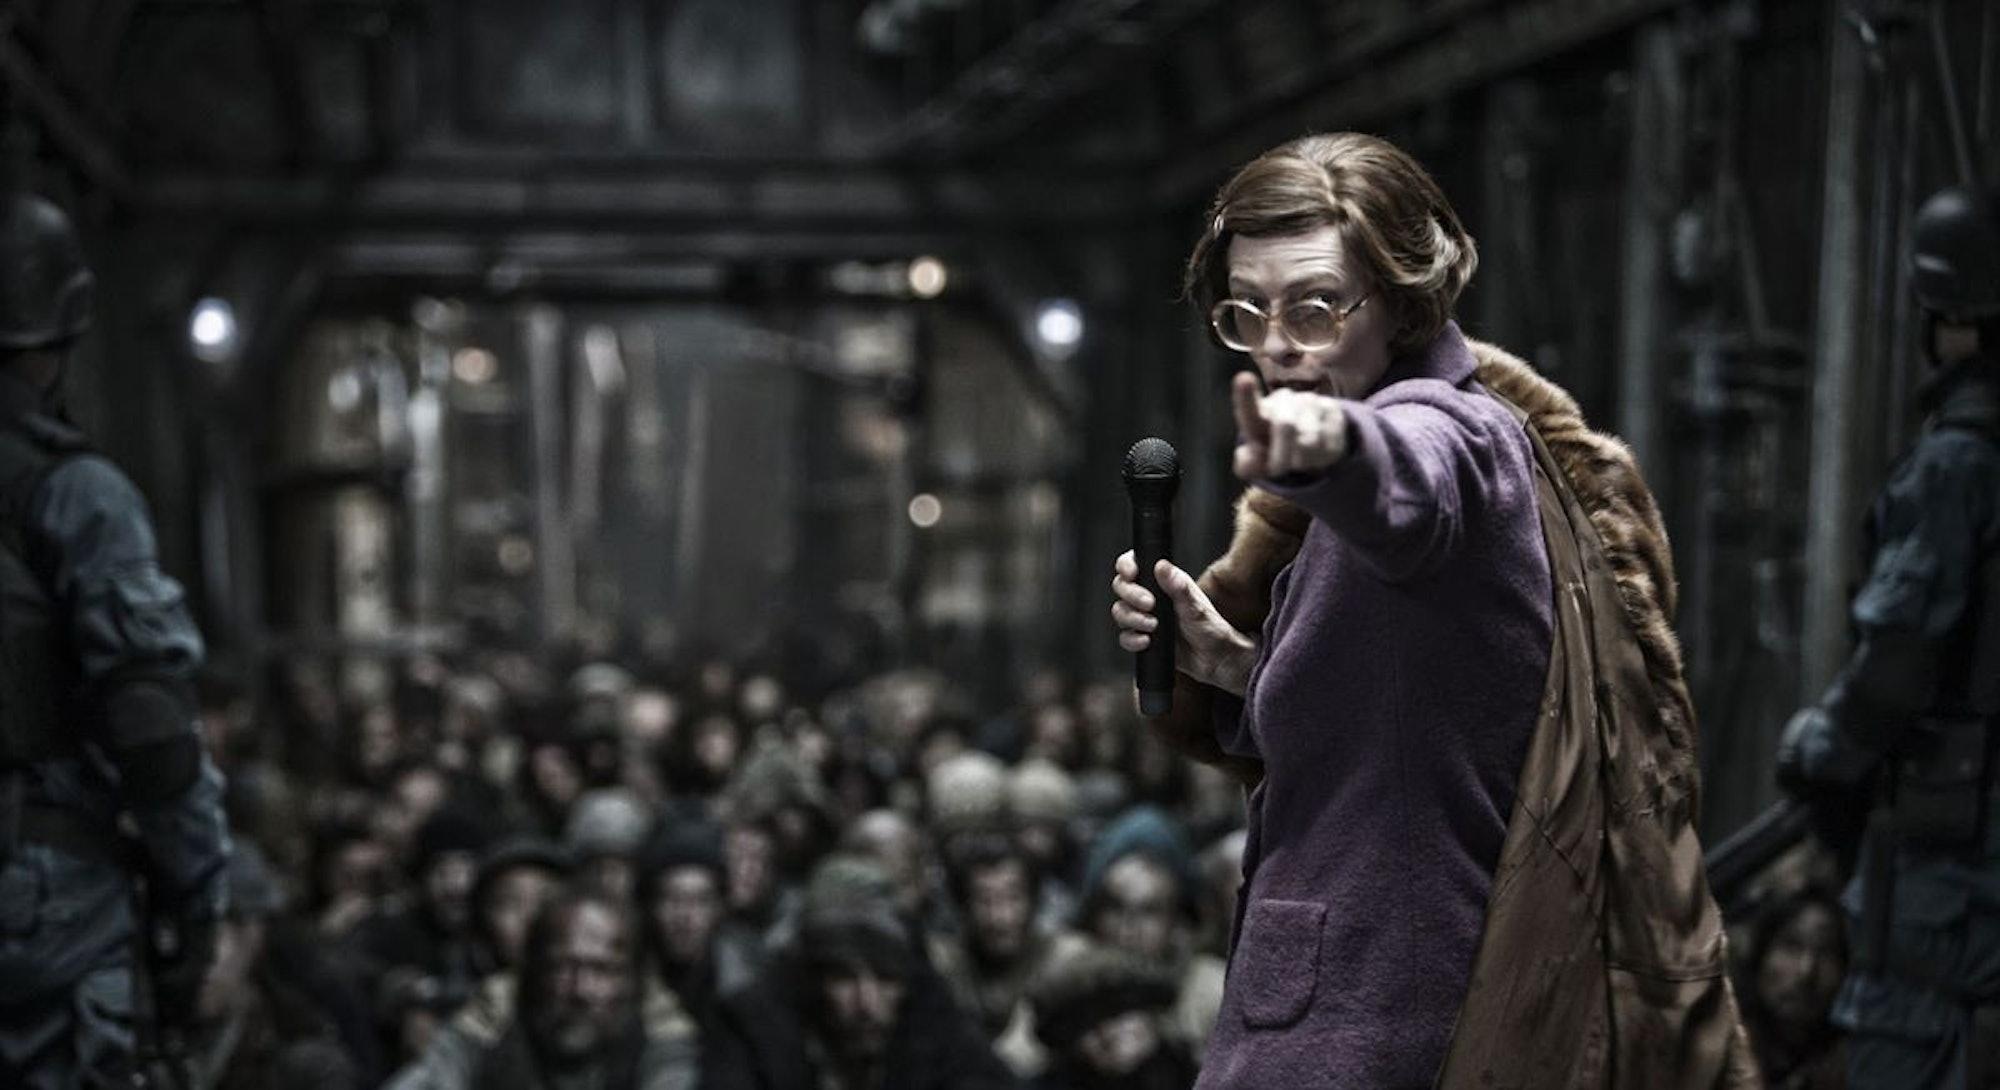 tilda swinton in purple suit and cape from snowpiercer